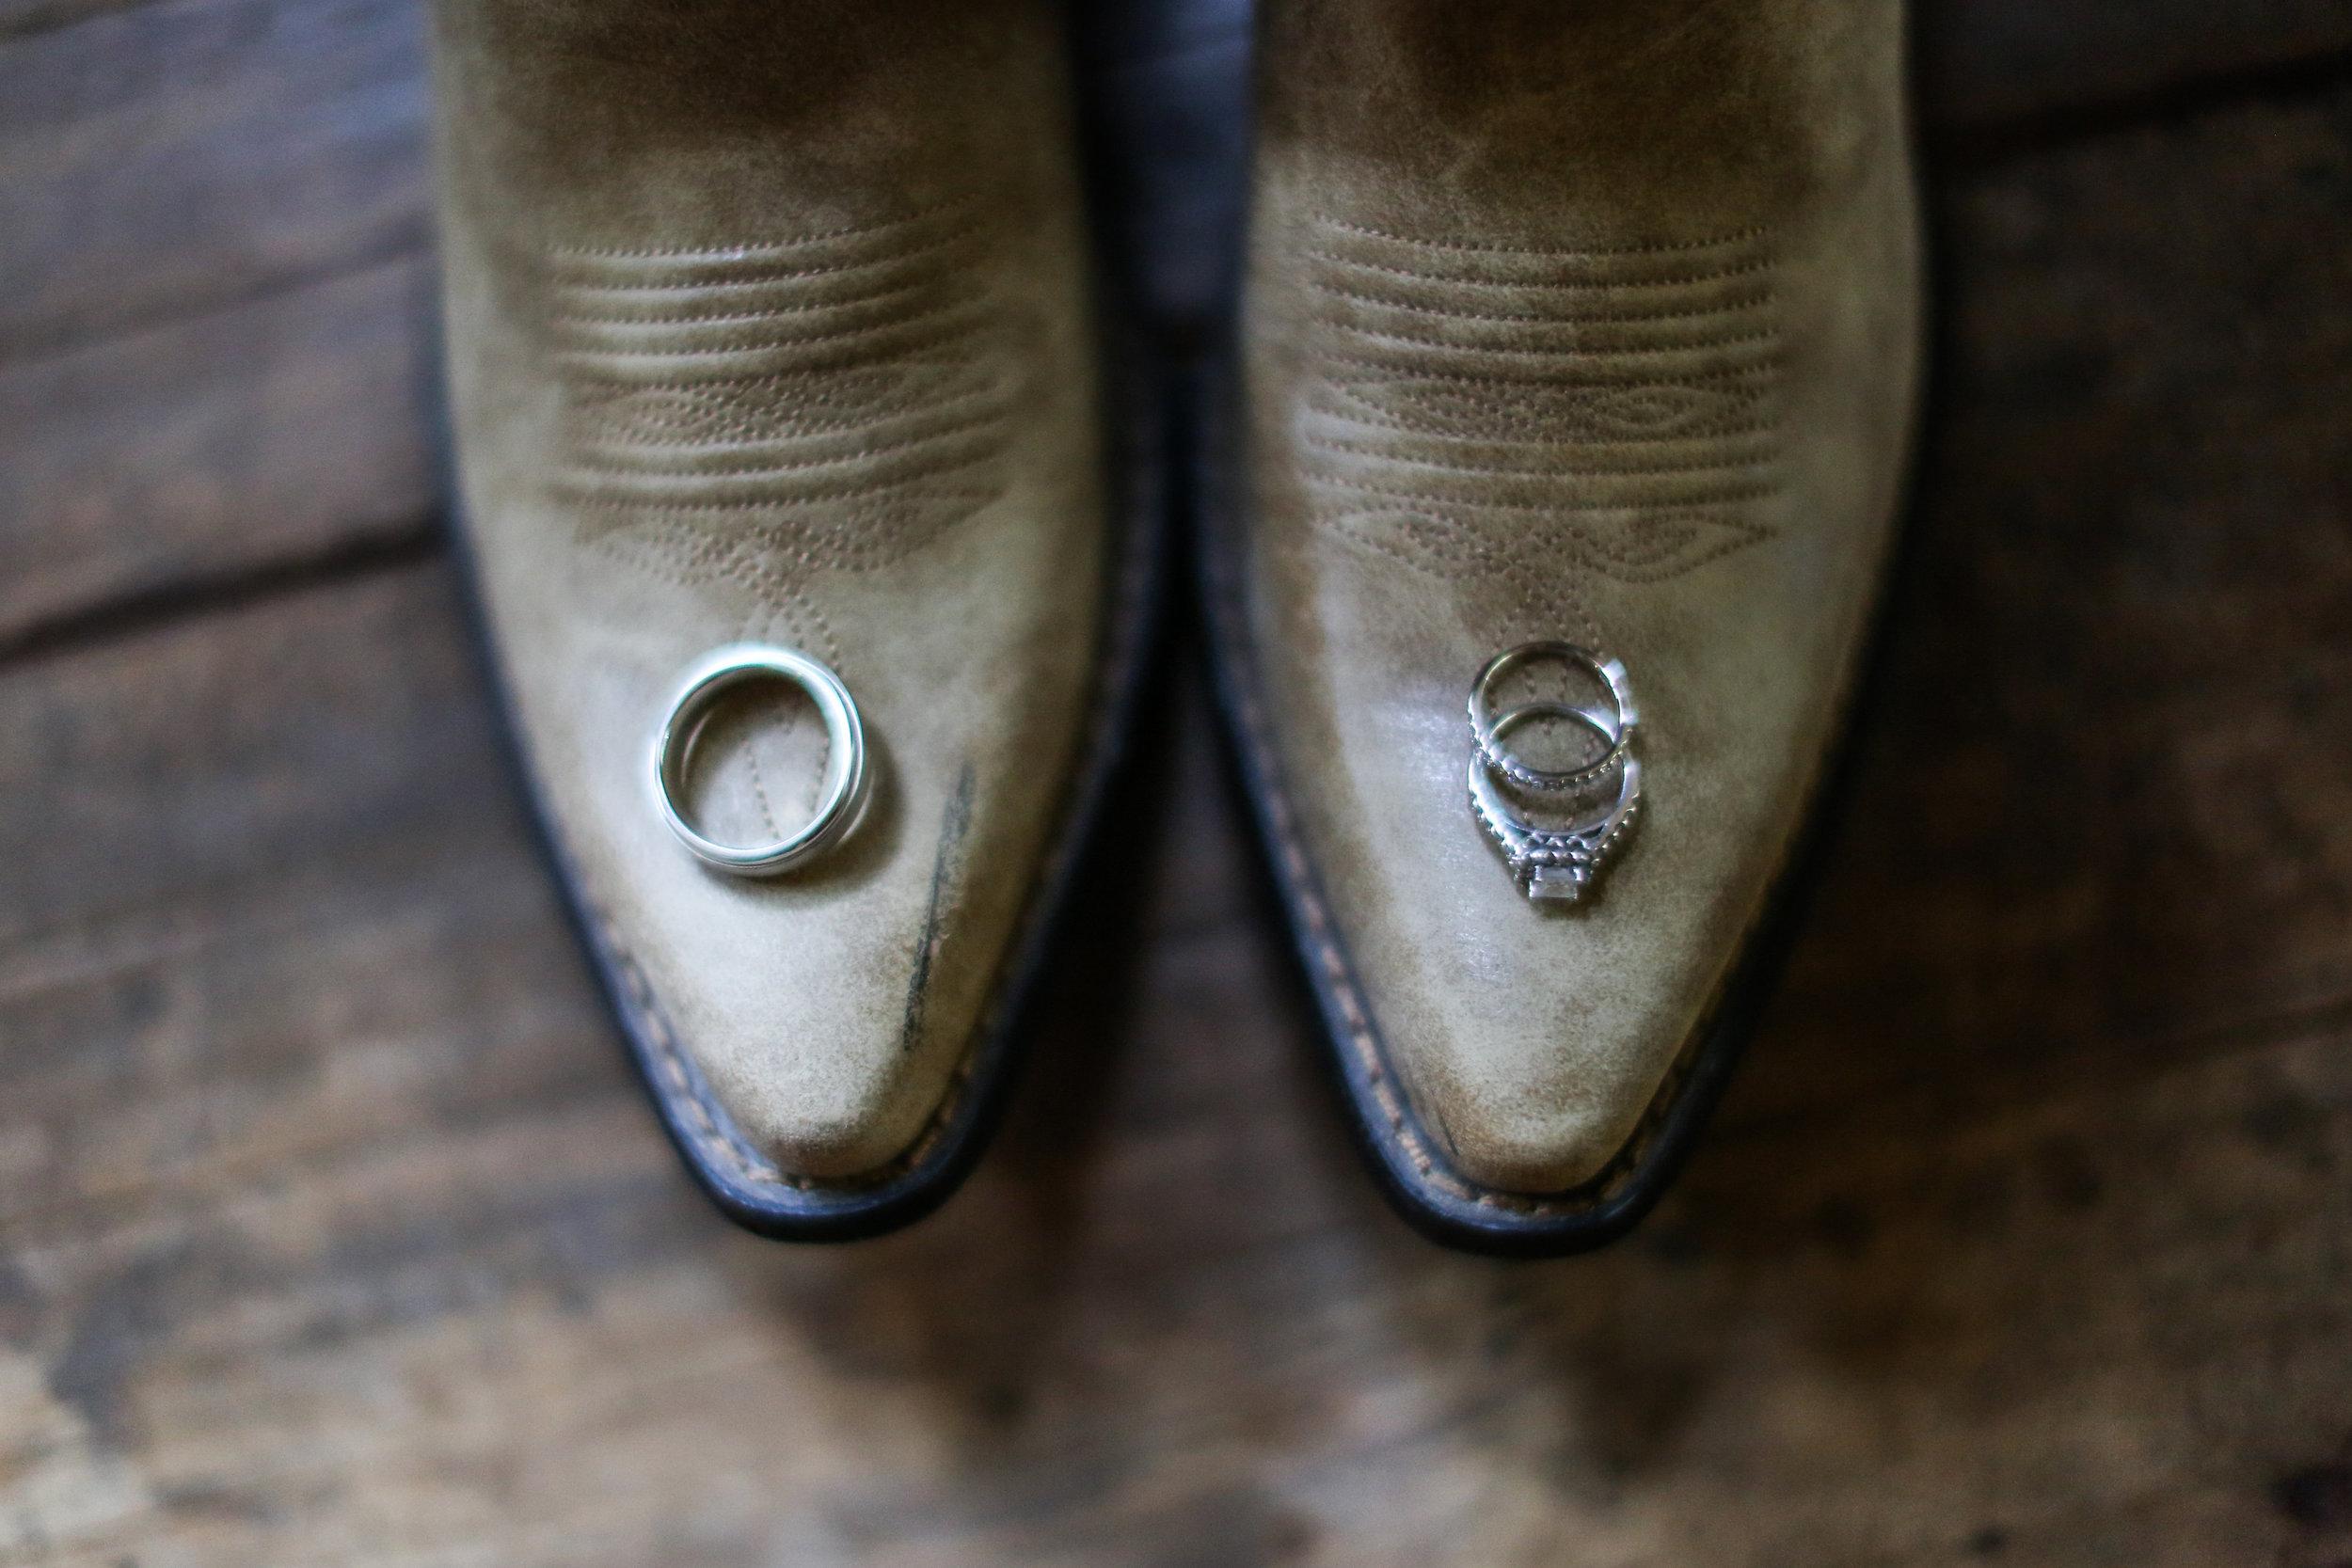 finnegan-photography-ivory-and-beau-bridal-boutique-nicole-miller-dakota-jaclyn-jordan-anne-veil-savannah-bridal-boutique-savannah-wedding-dresses-savannah-weddings-statesboro-wedding-barn-wedding-savannah-bridal-georgia-bridal-boutique-3.jpg